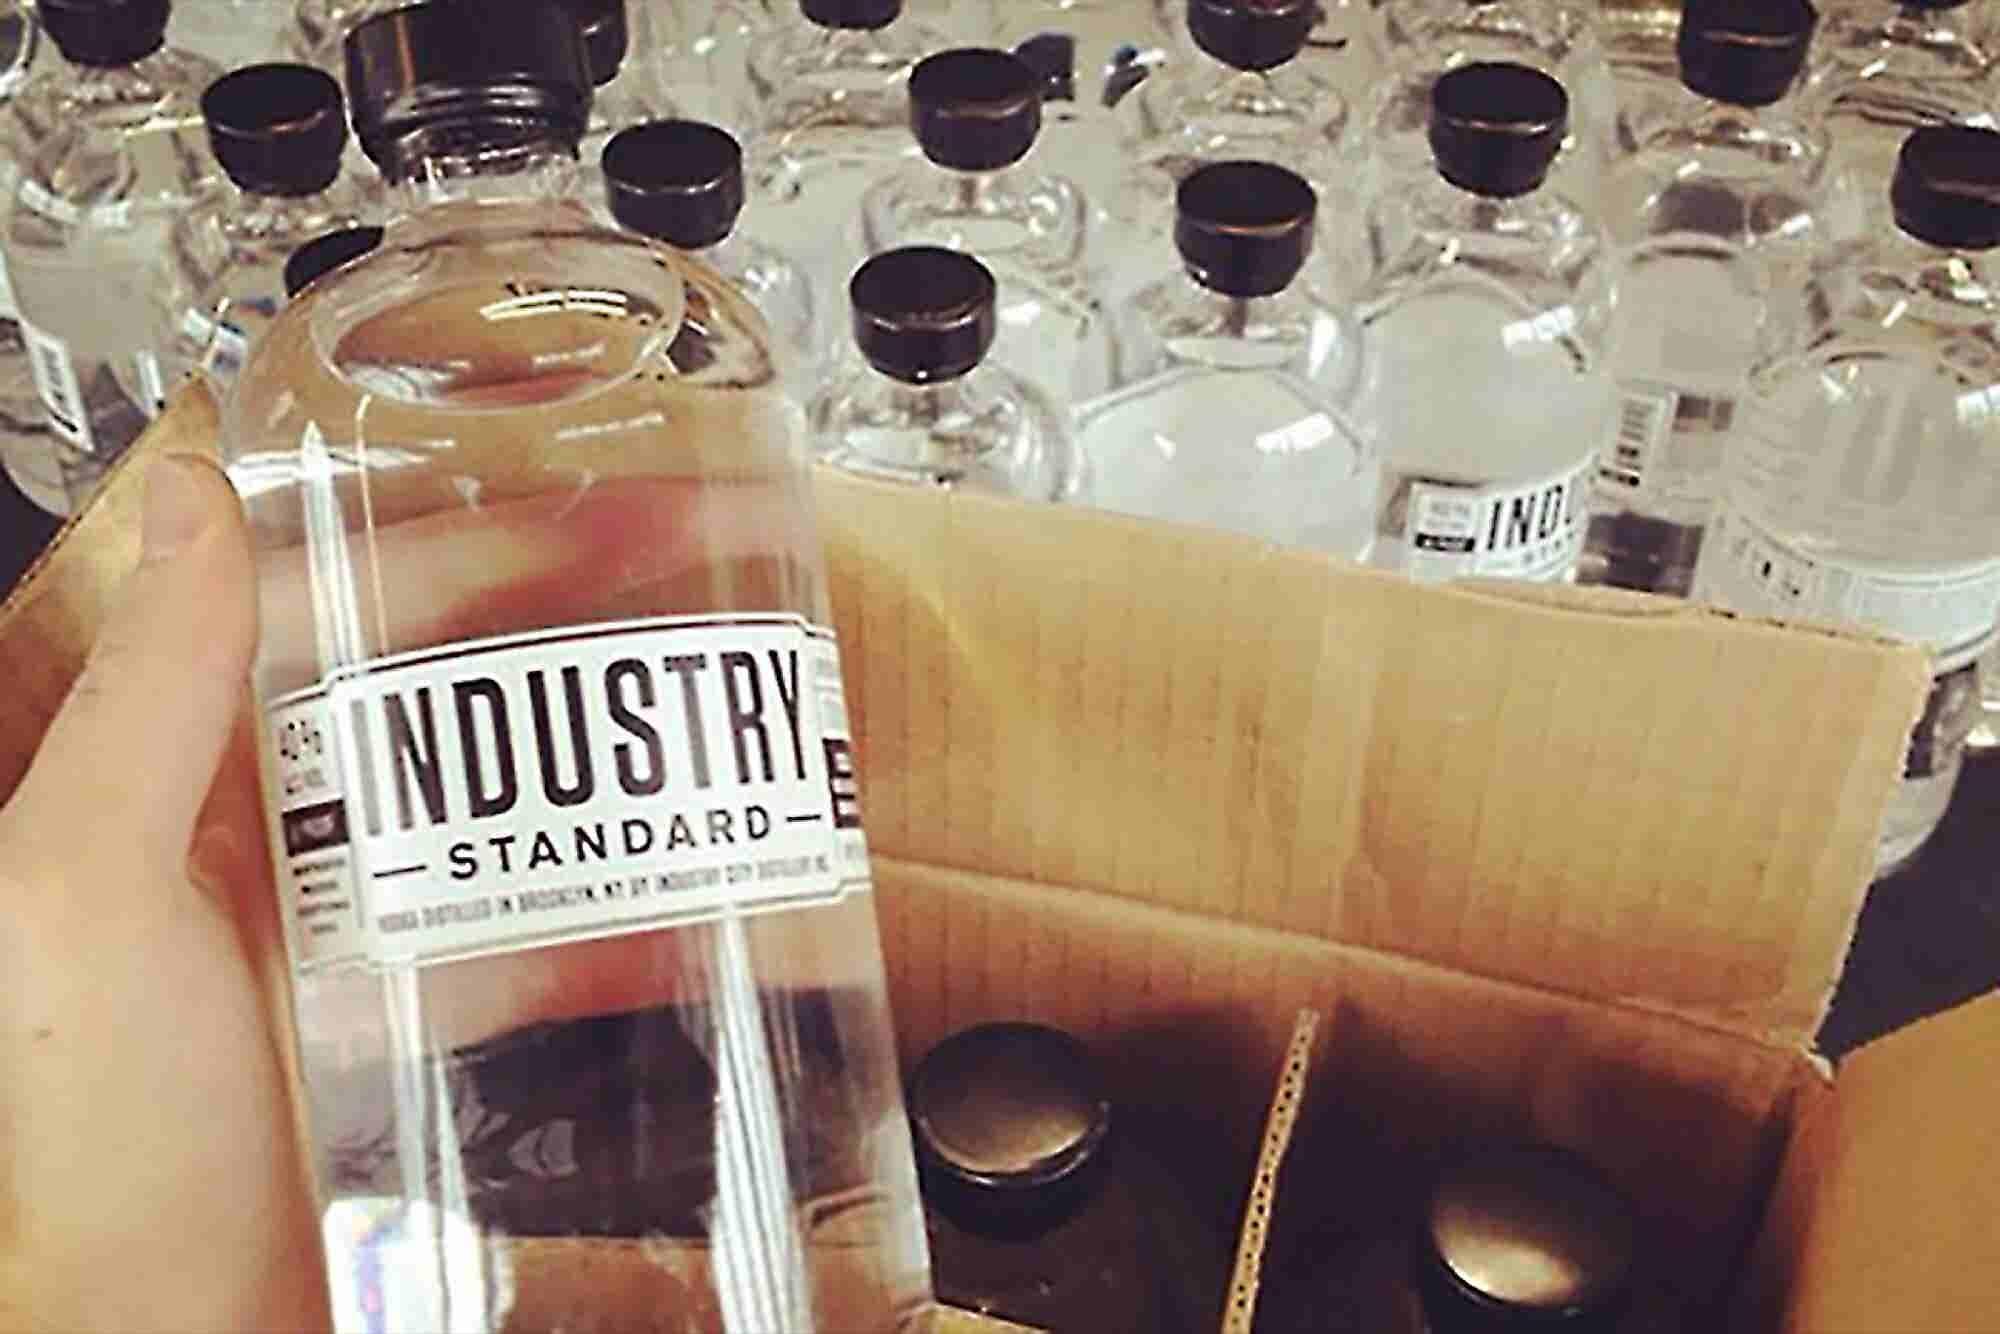 These Entrepreneurs Found a Way to Make Energy-Efficient Vodka